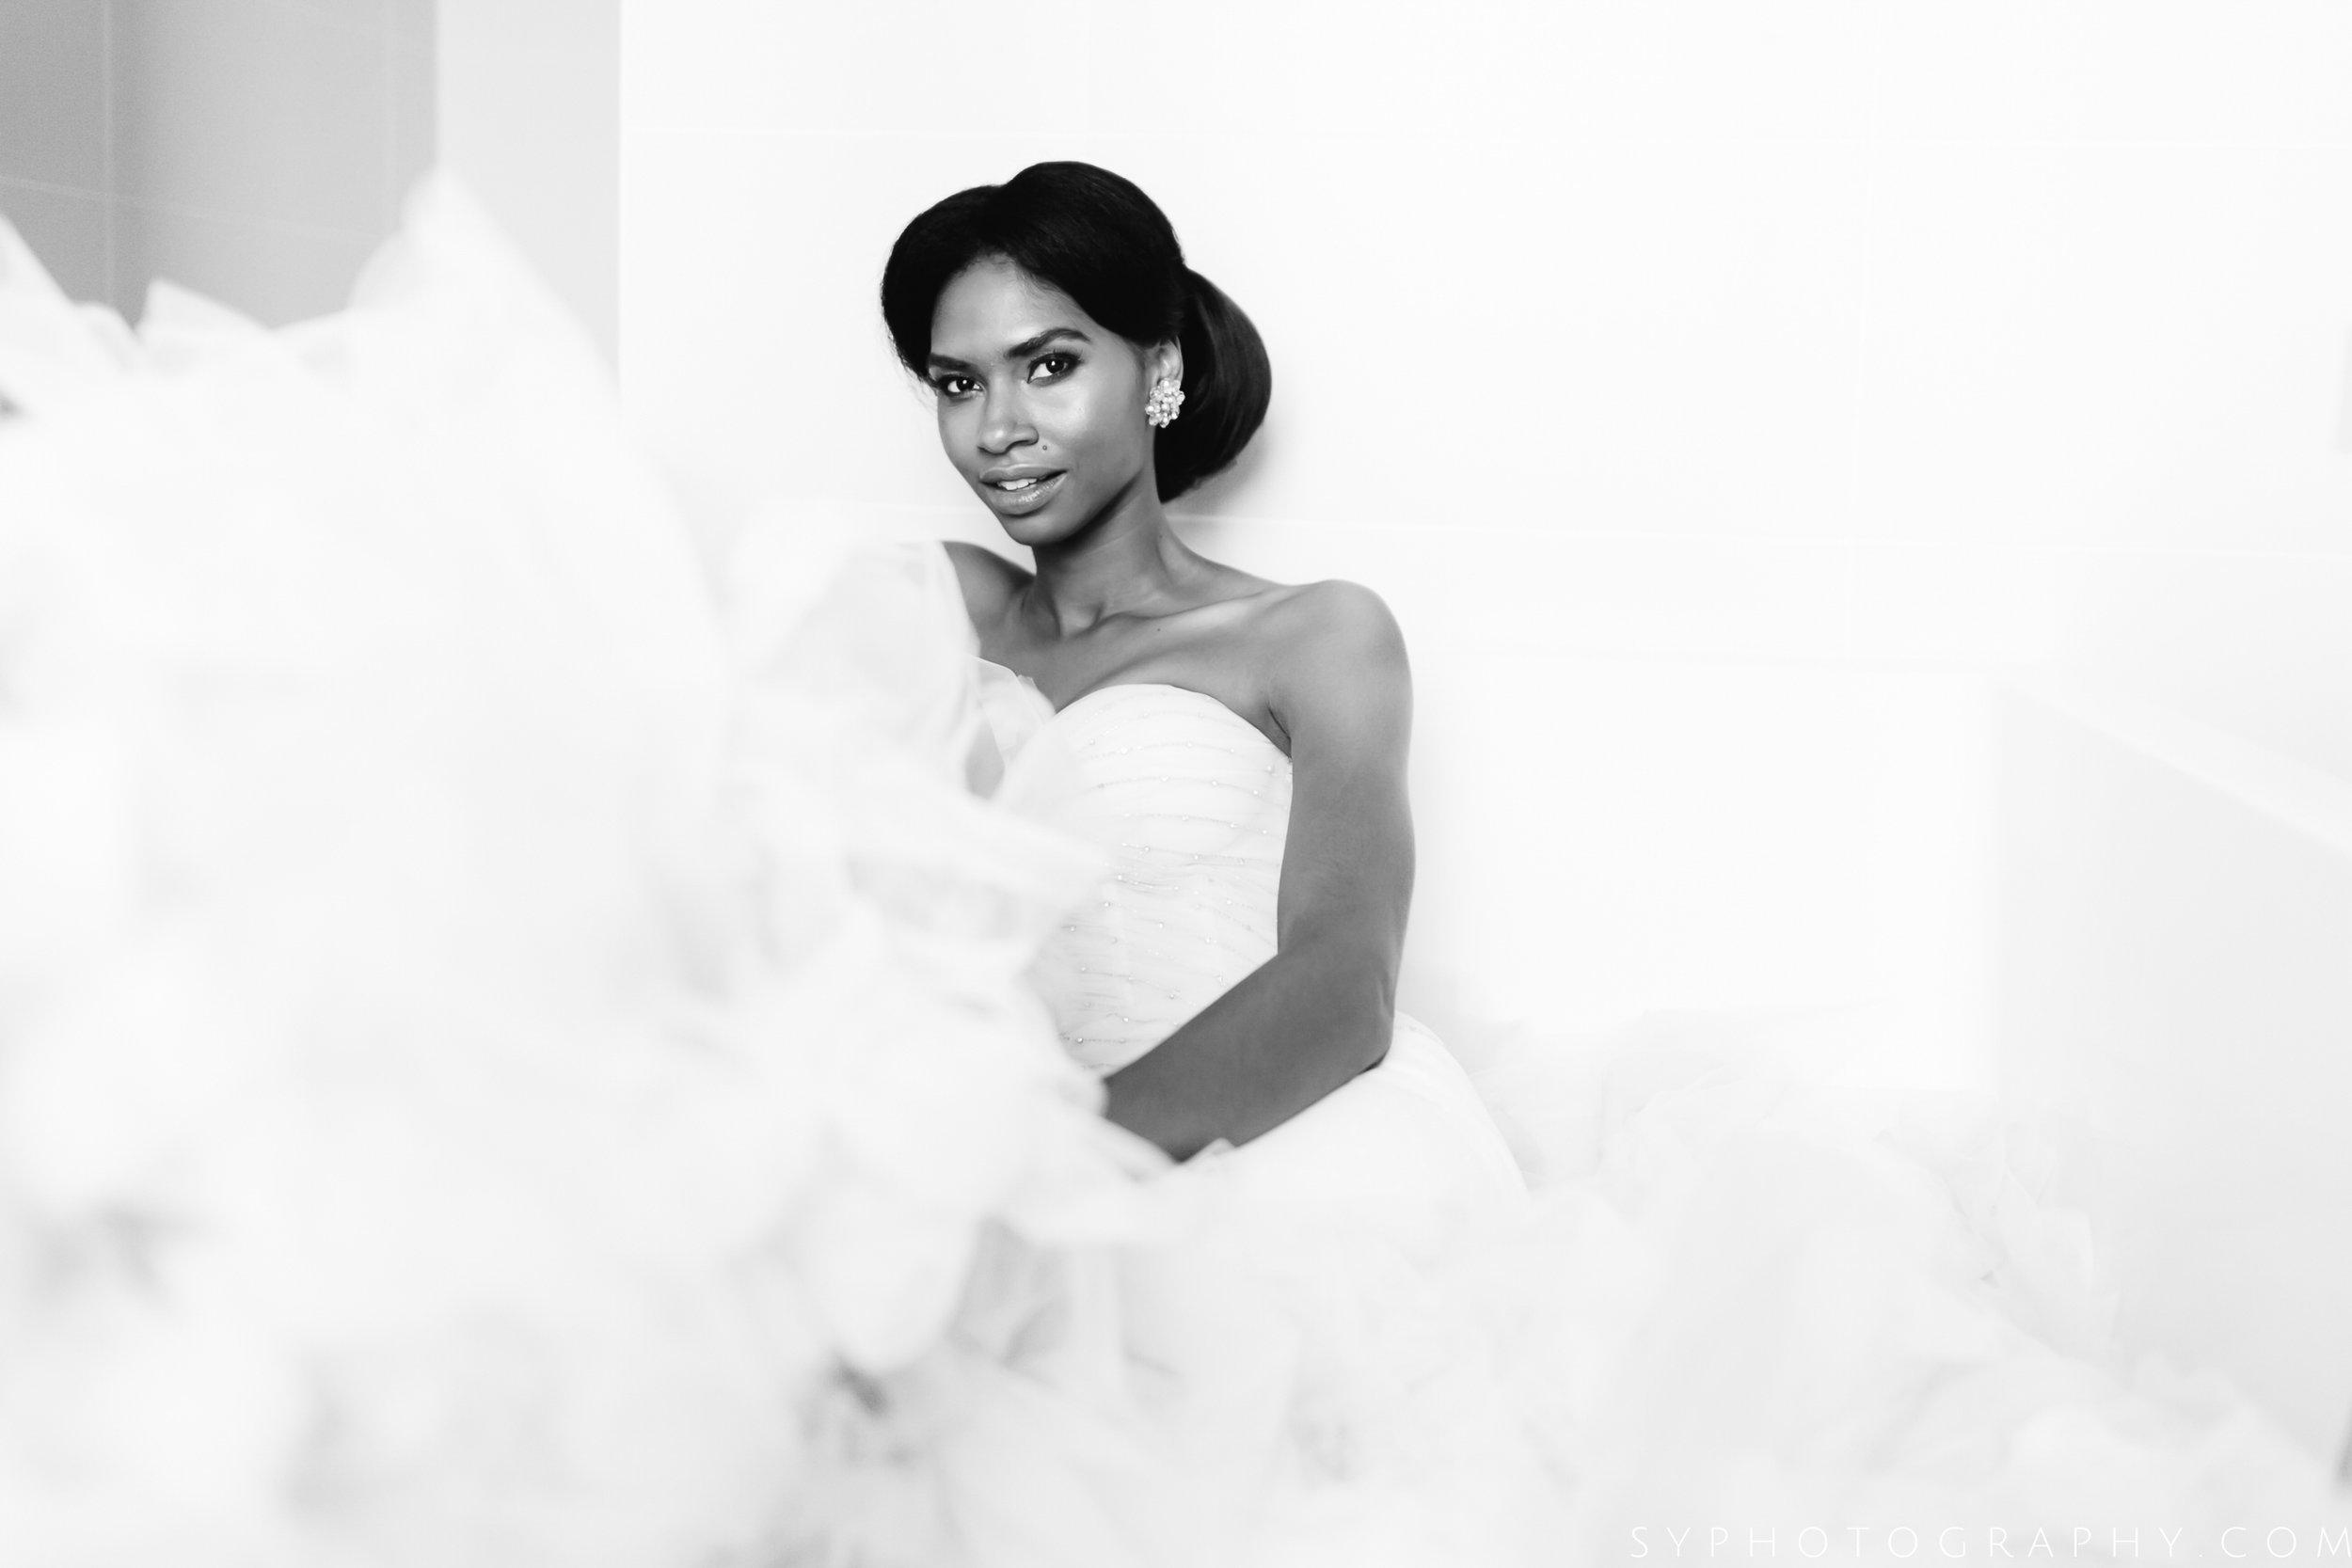 Credits:   Sy Photography   |   Dimitras Bridal   |   Caroline Shaw: The Wedding Dresser   |   Hair by Juan Jose   |   Bridal by Aga Rhoses